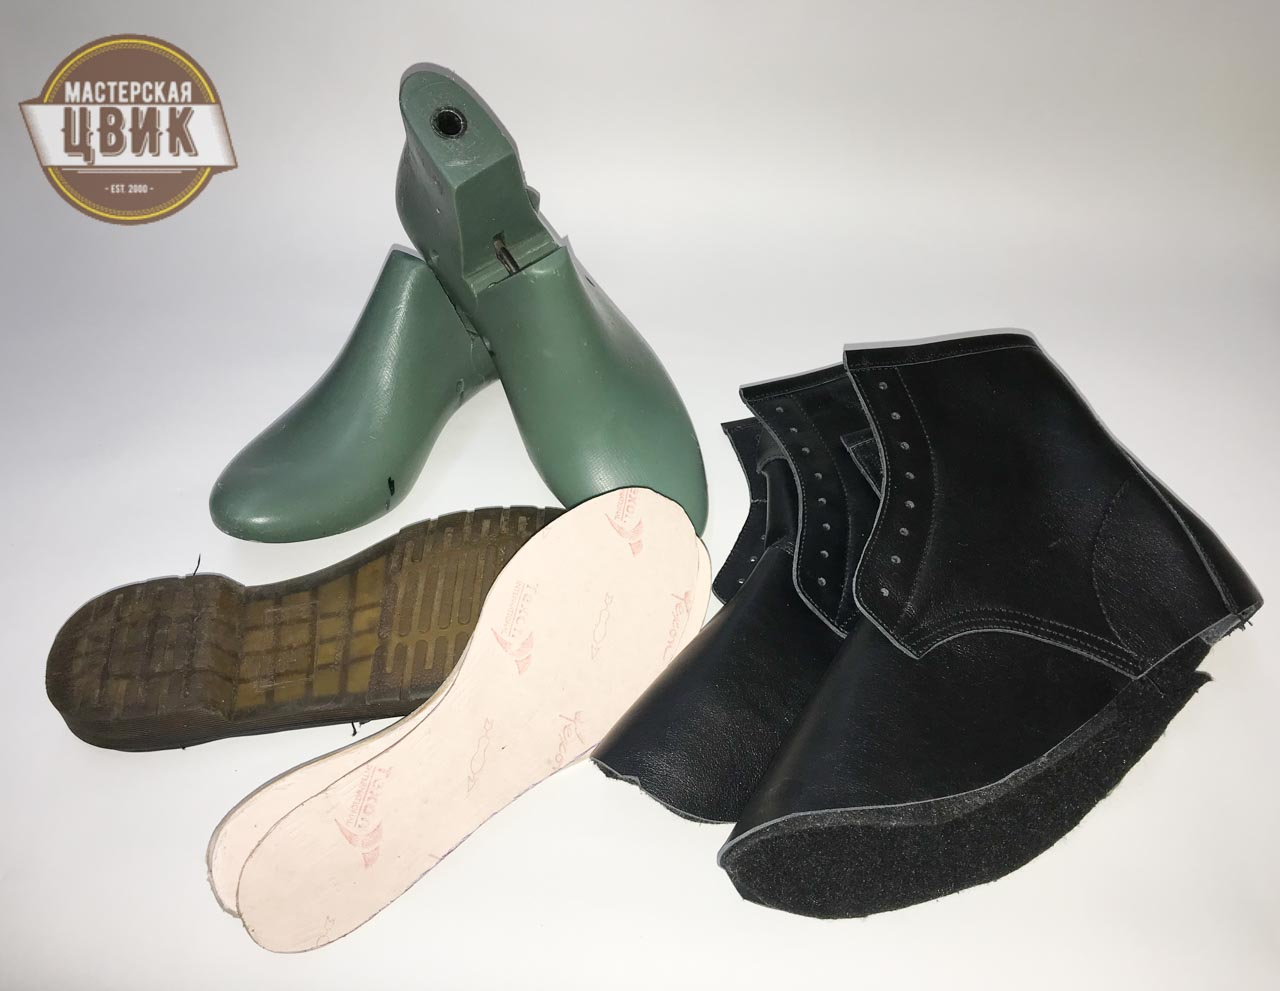 individualnyj-poshiv-obuvi-minsk-55 Индивидуальный пошив обуви